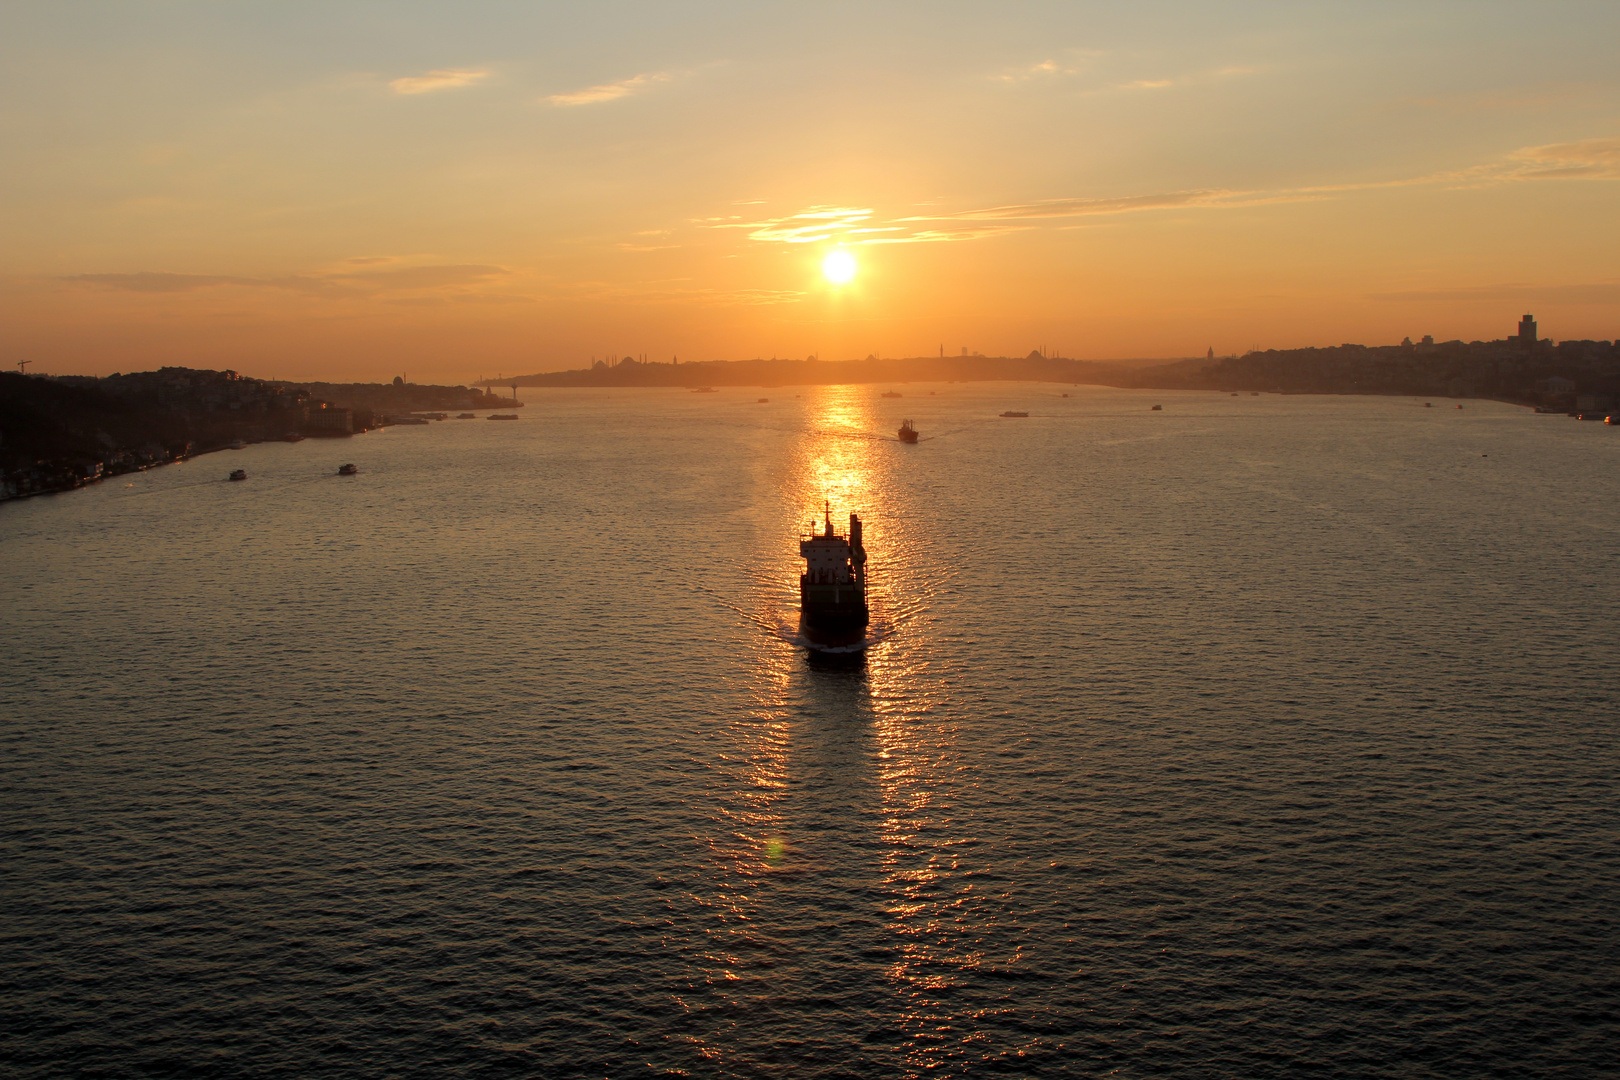 Sunset at Bosphorus